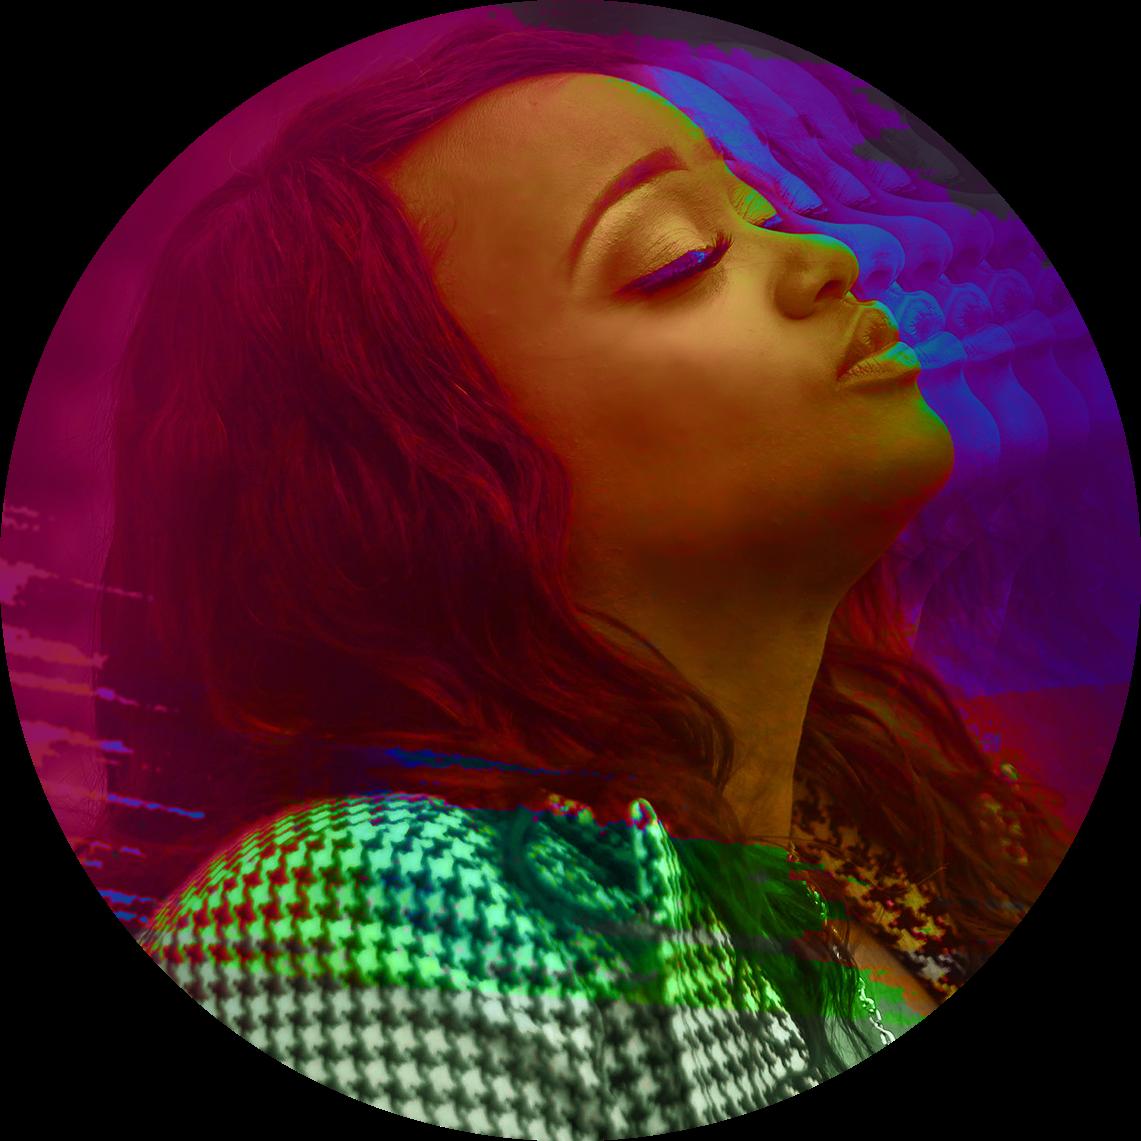 @shonniemurrell Profile Image   Linktree